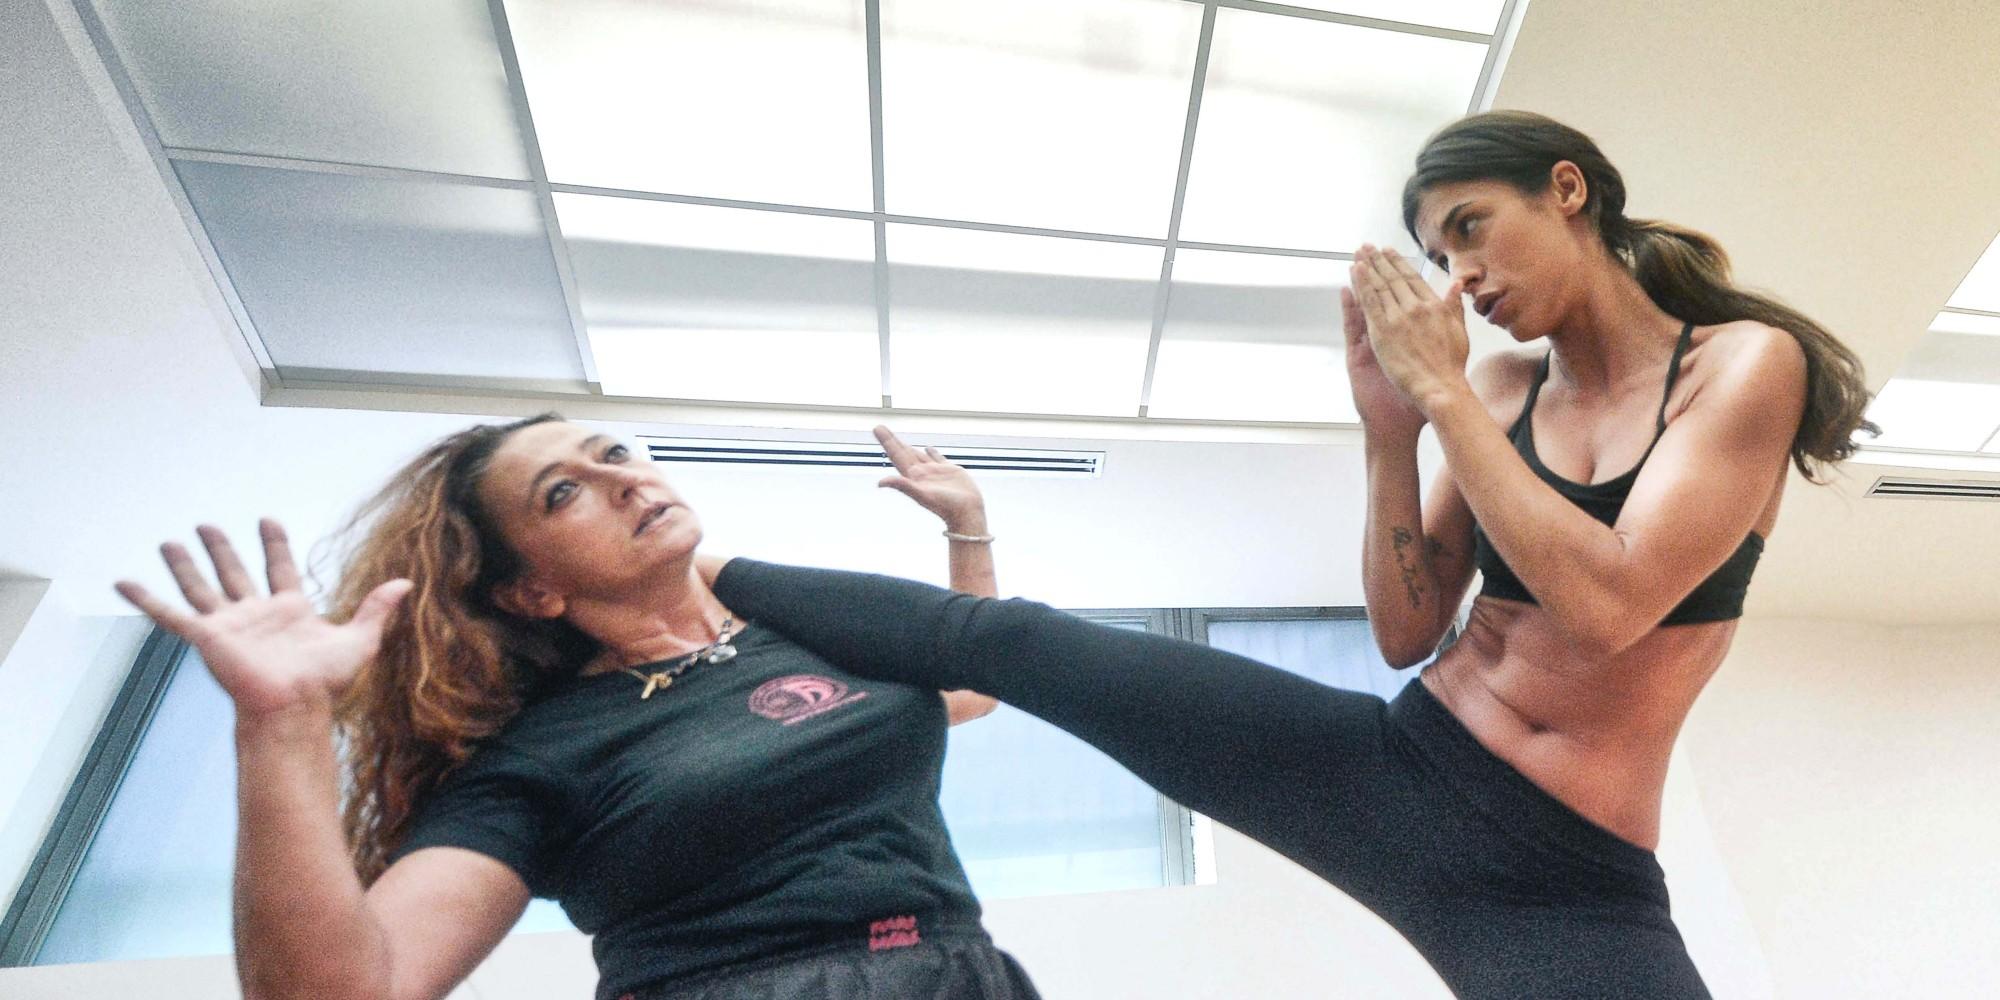 Elisabetta Canalis Will Kick Your Butt In A Sports Bra